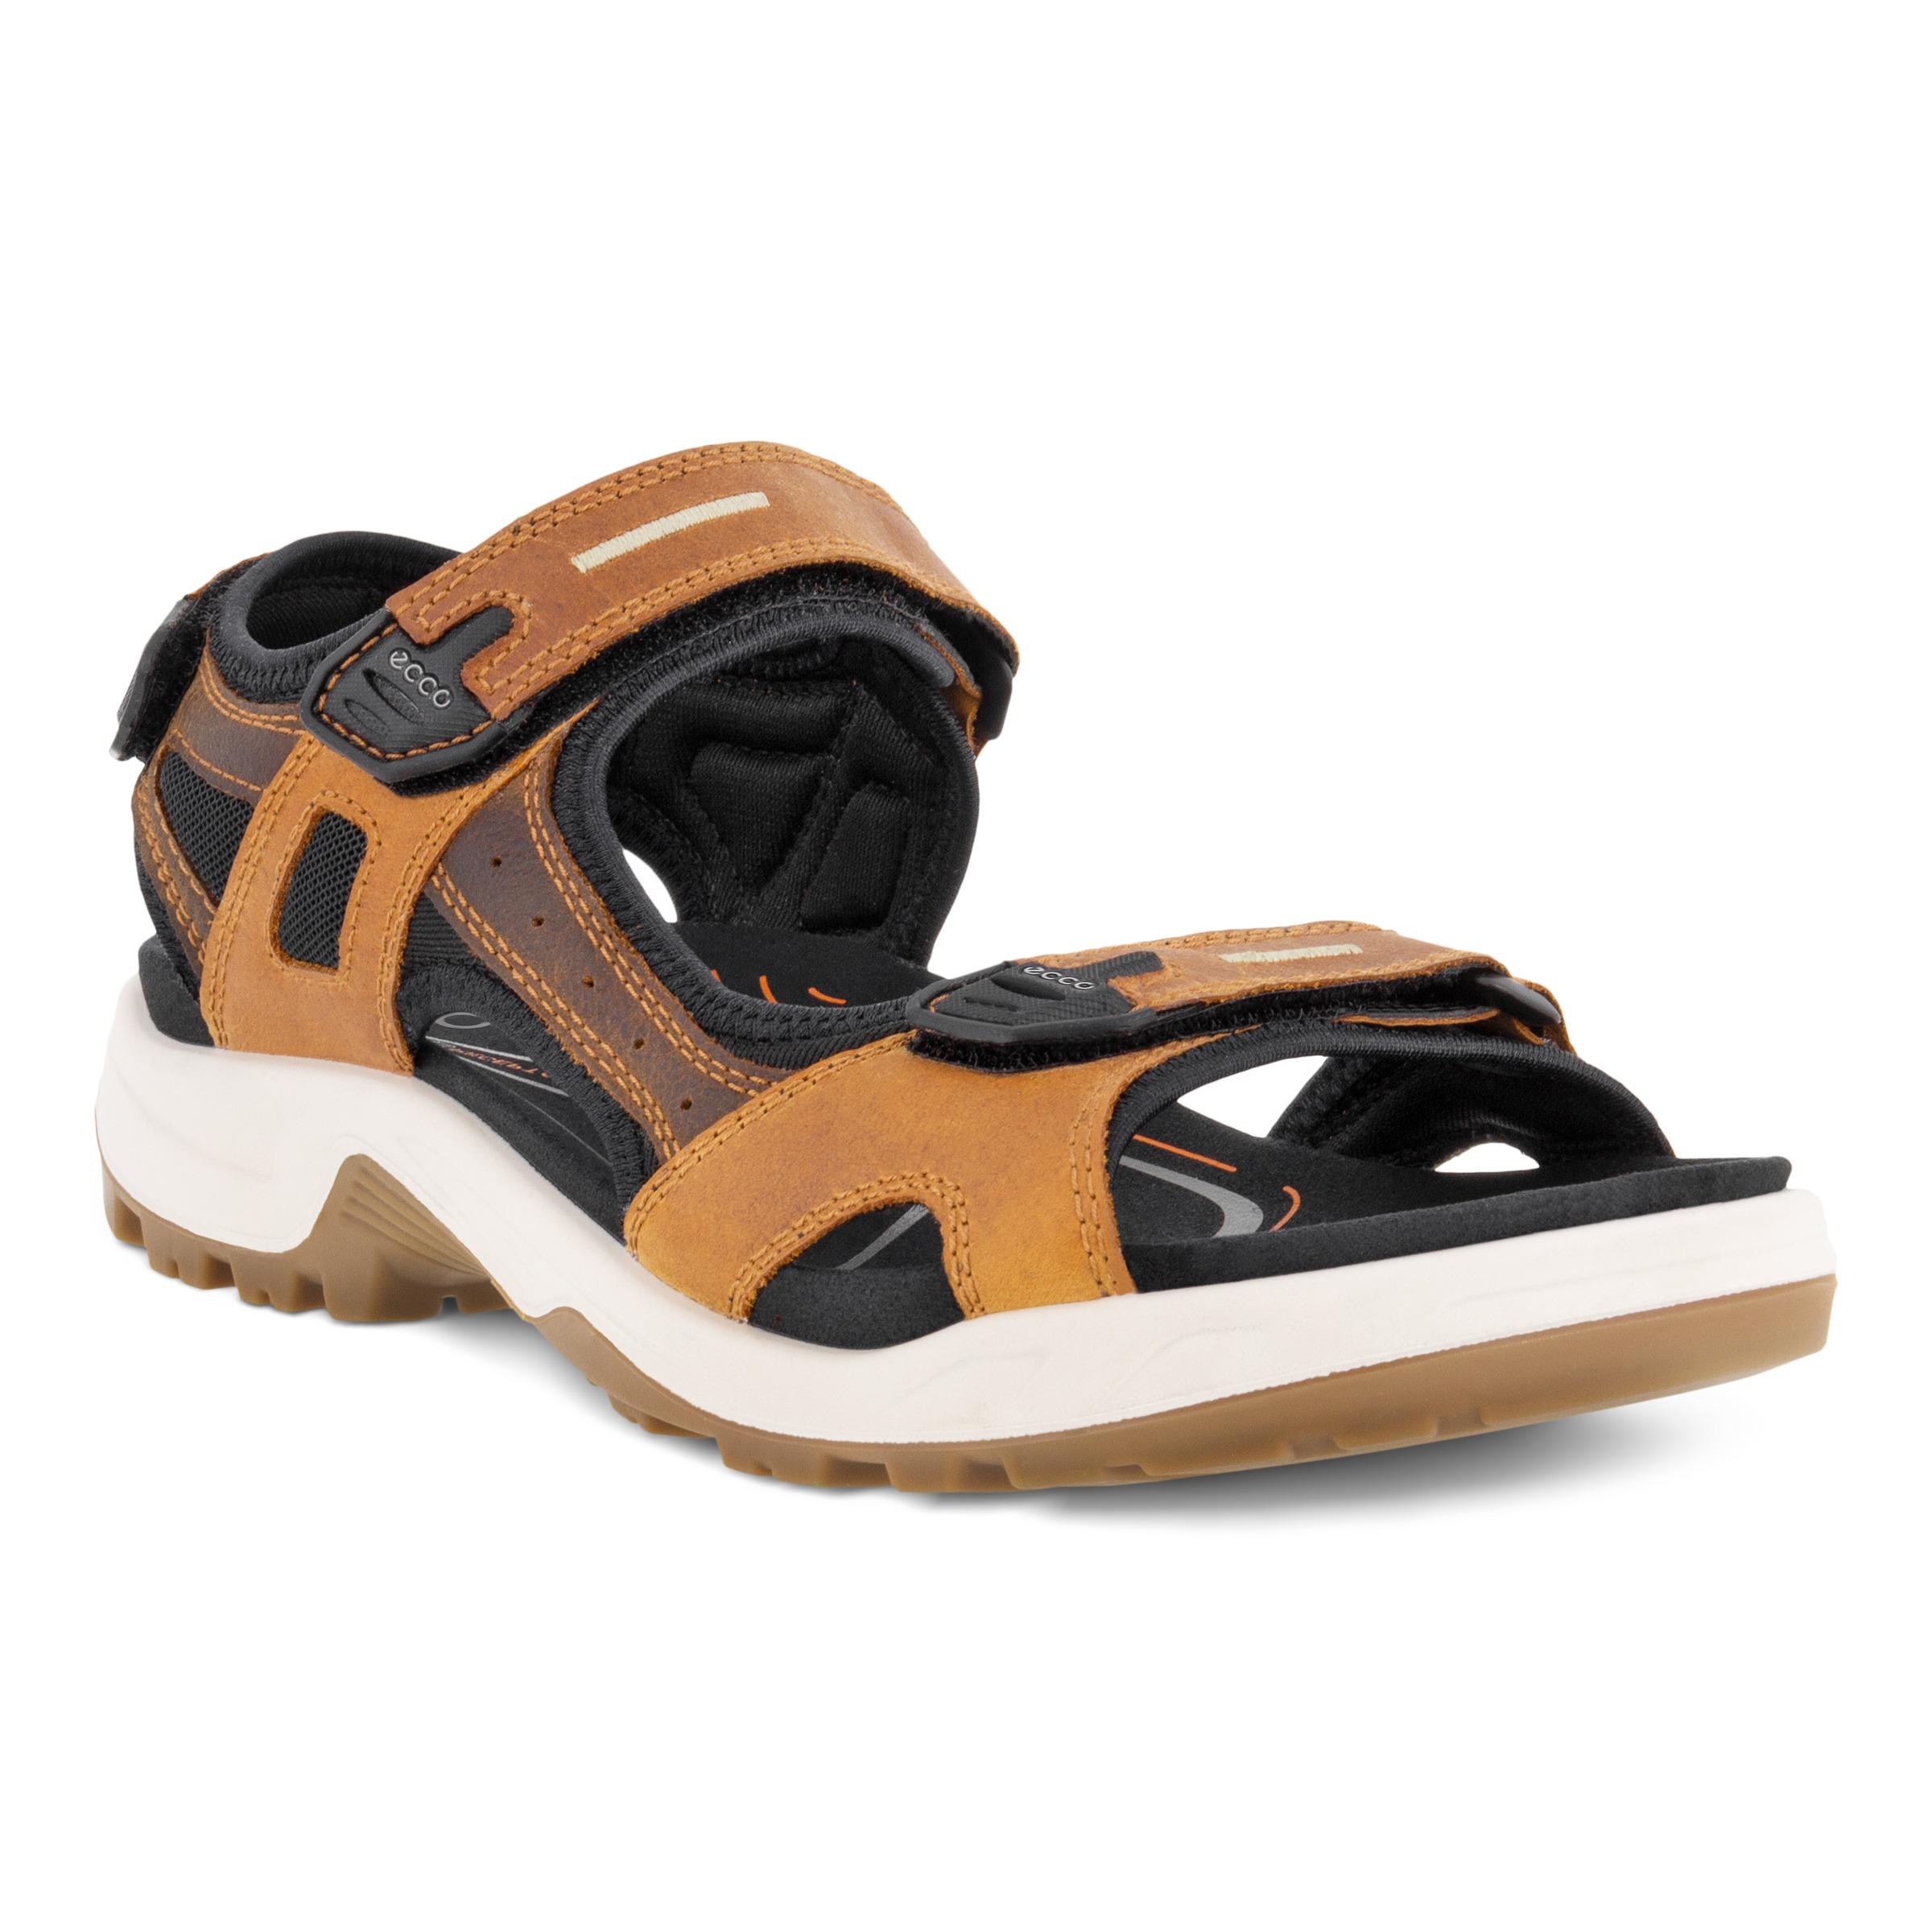 Ecco Offroad herre sandal